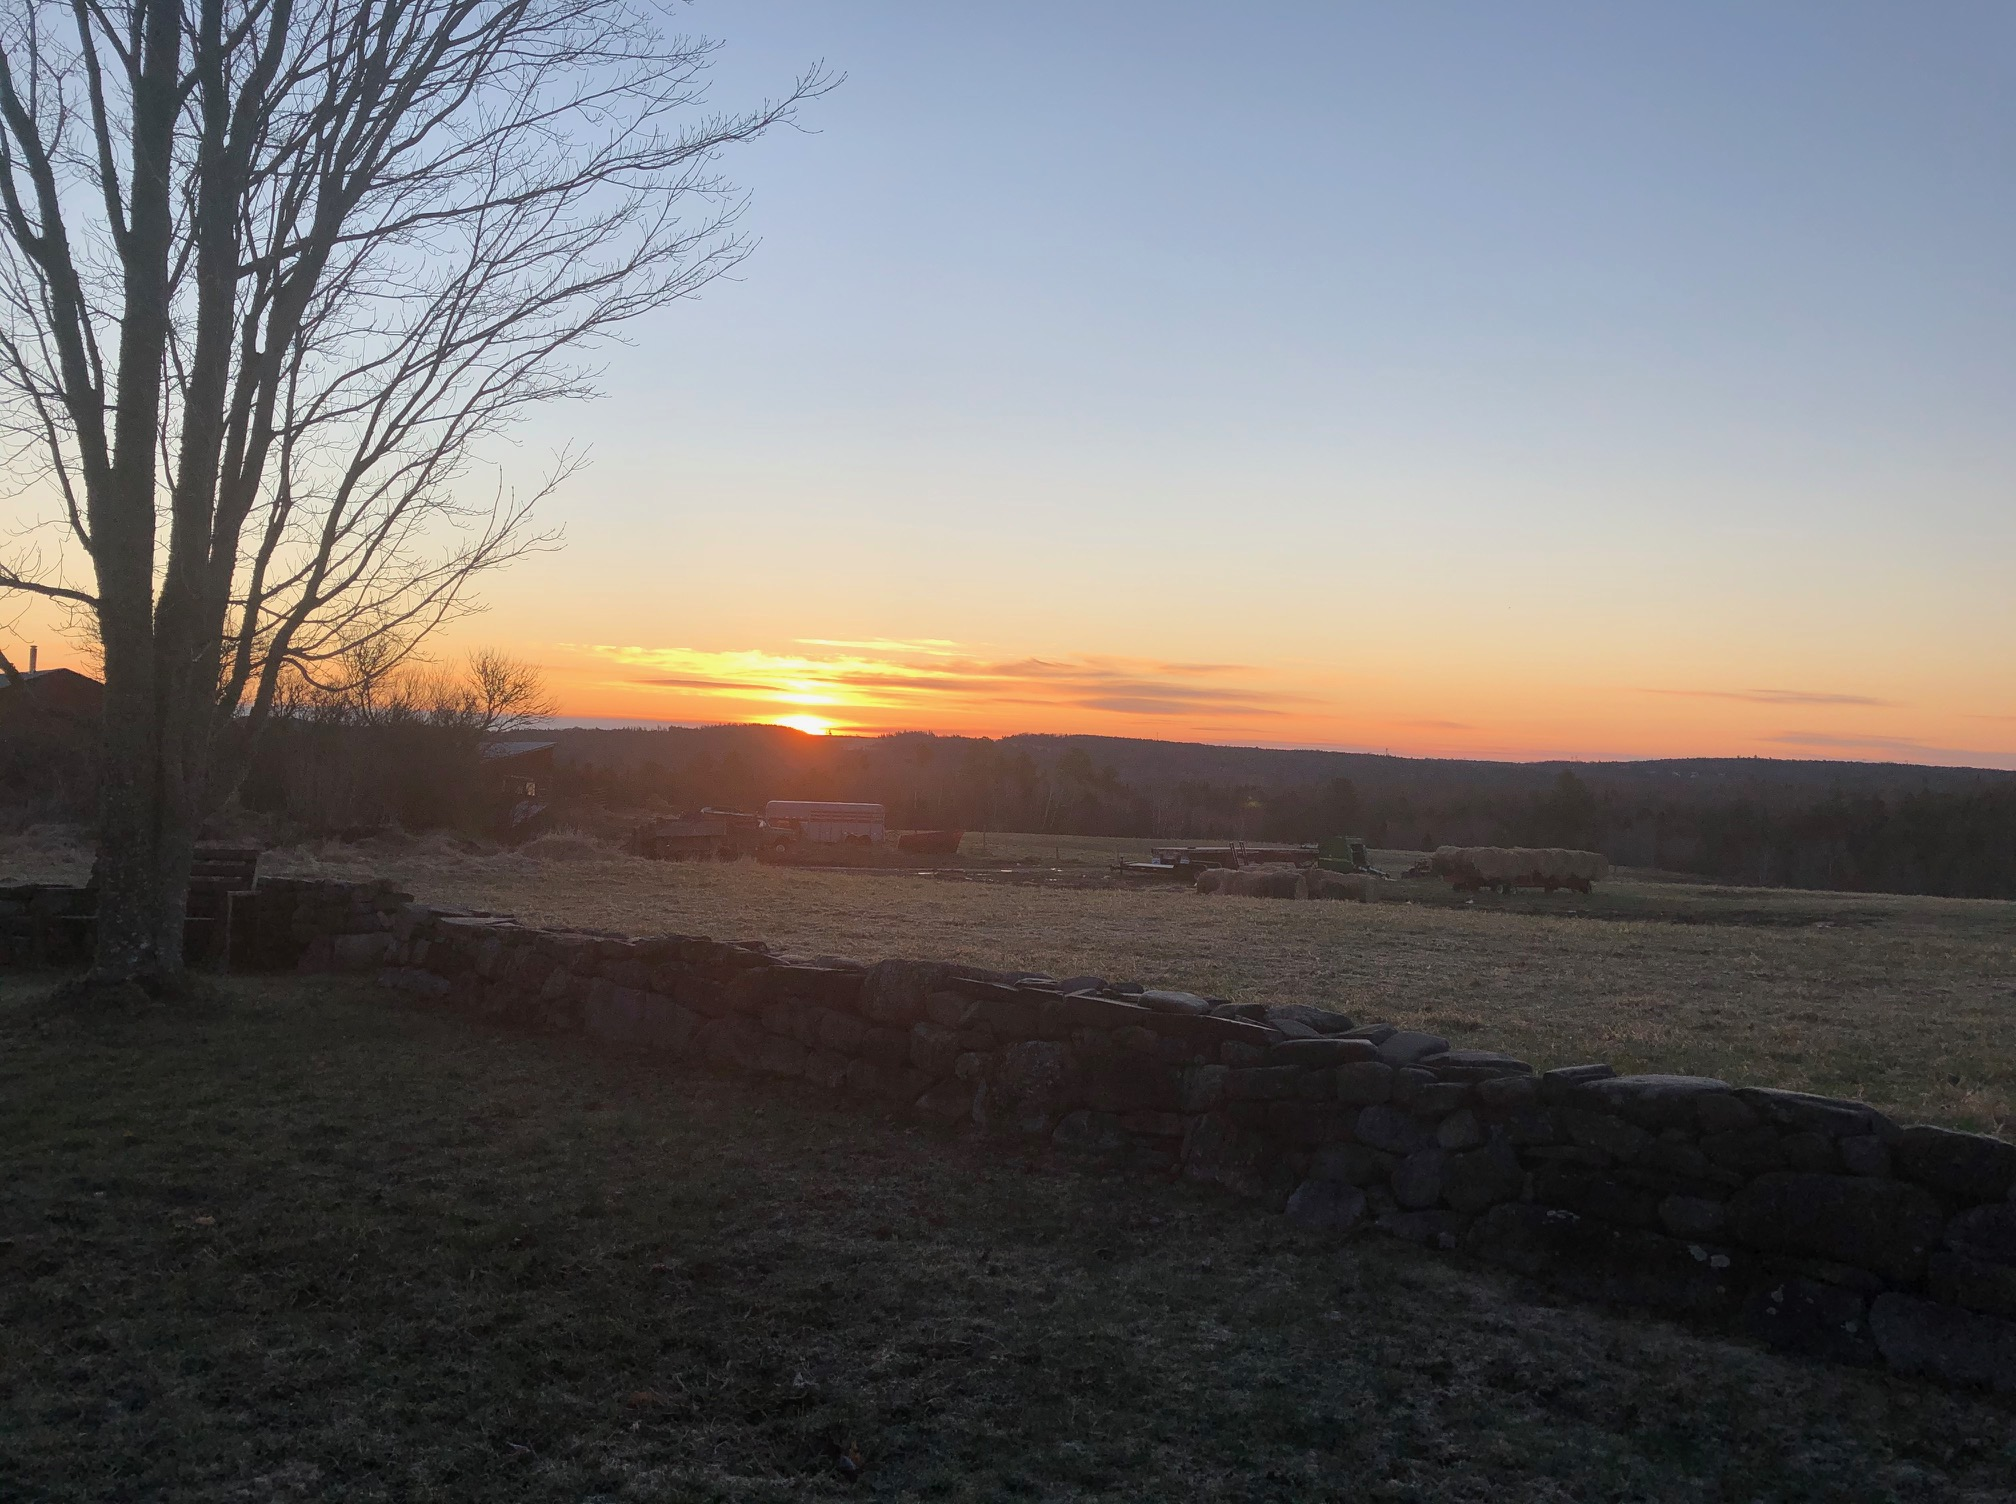 Dawn in my backyard, spring 2020